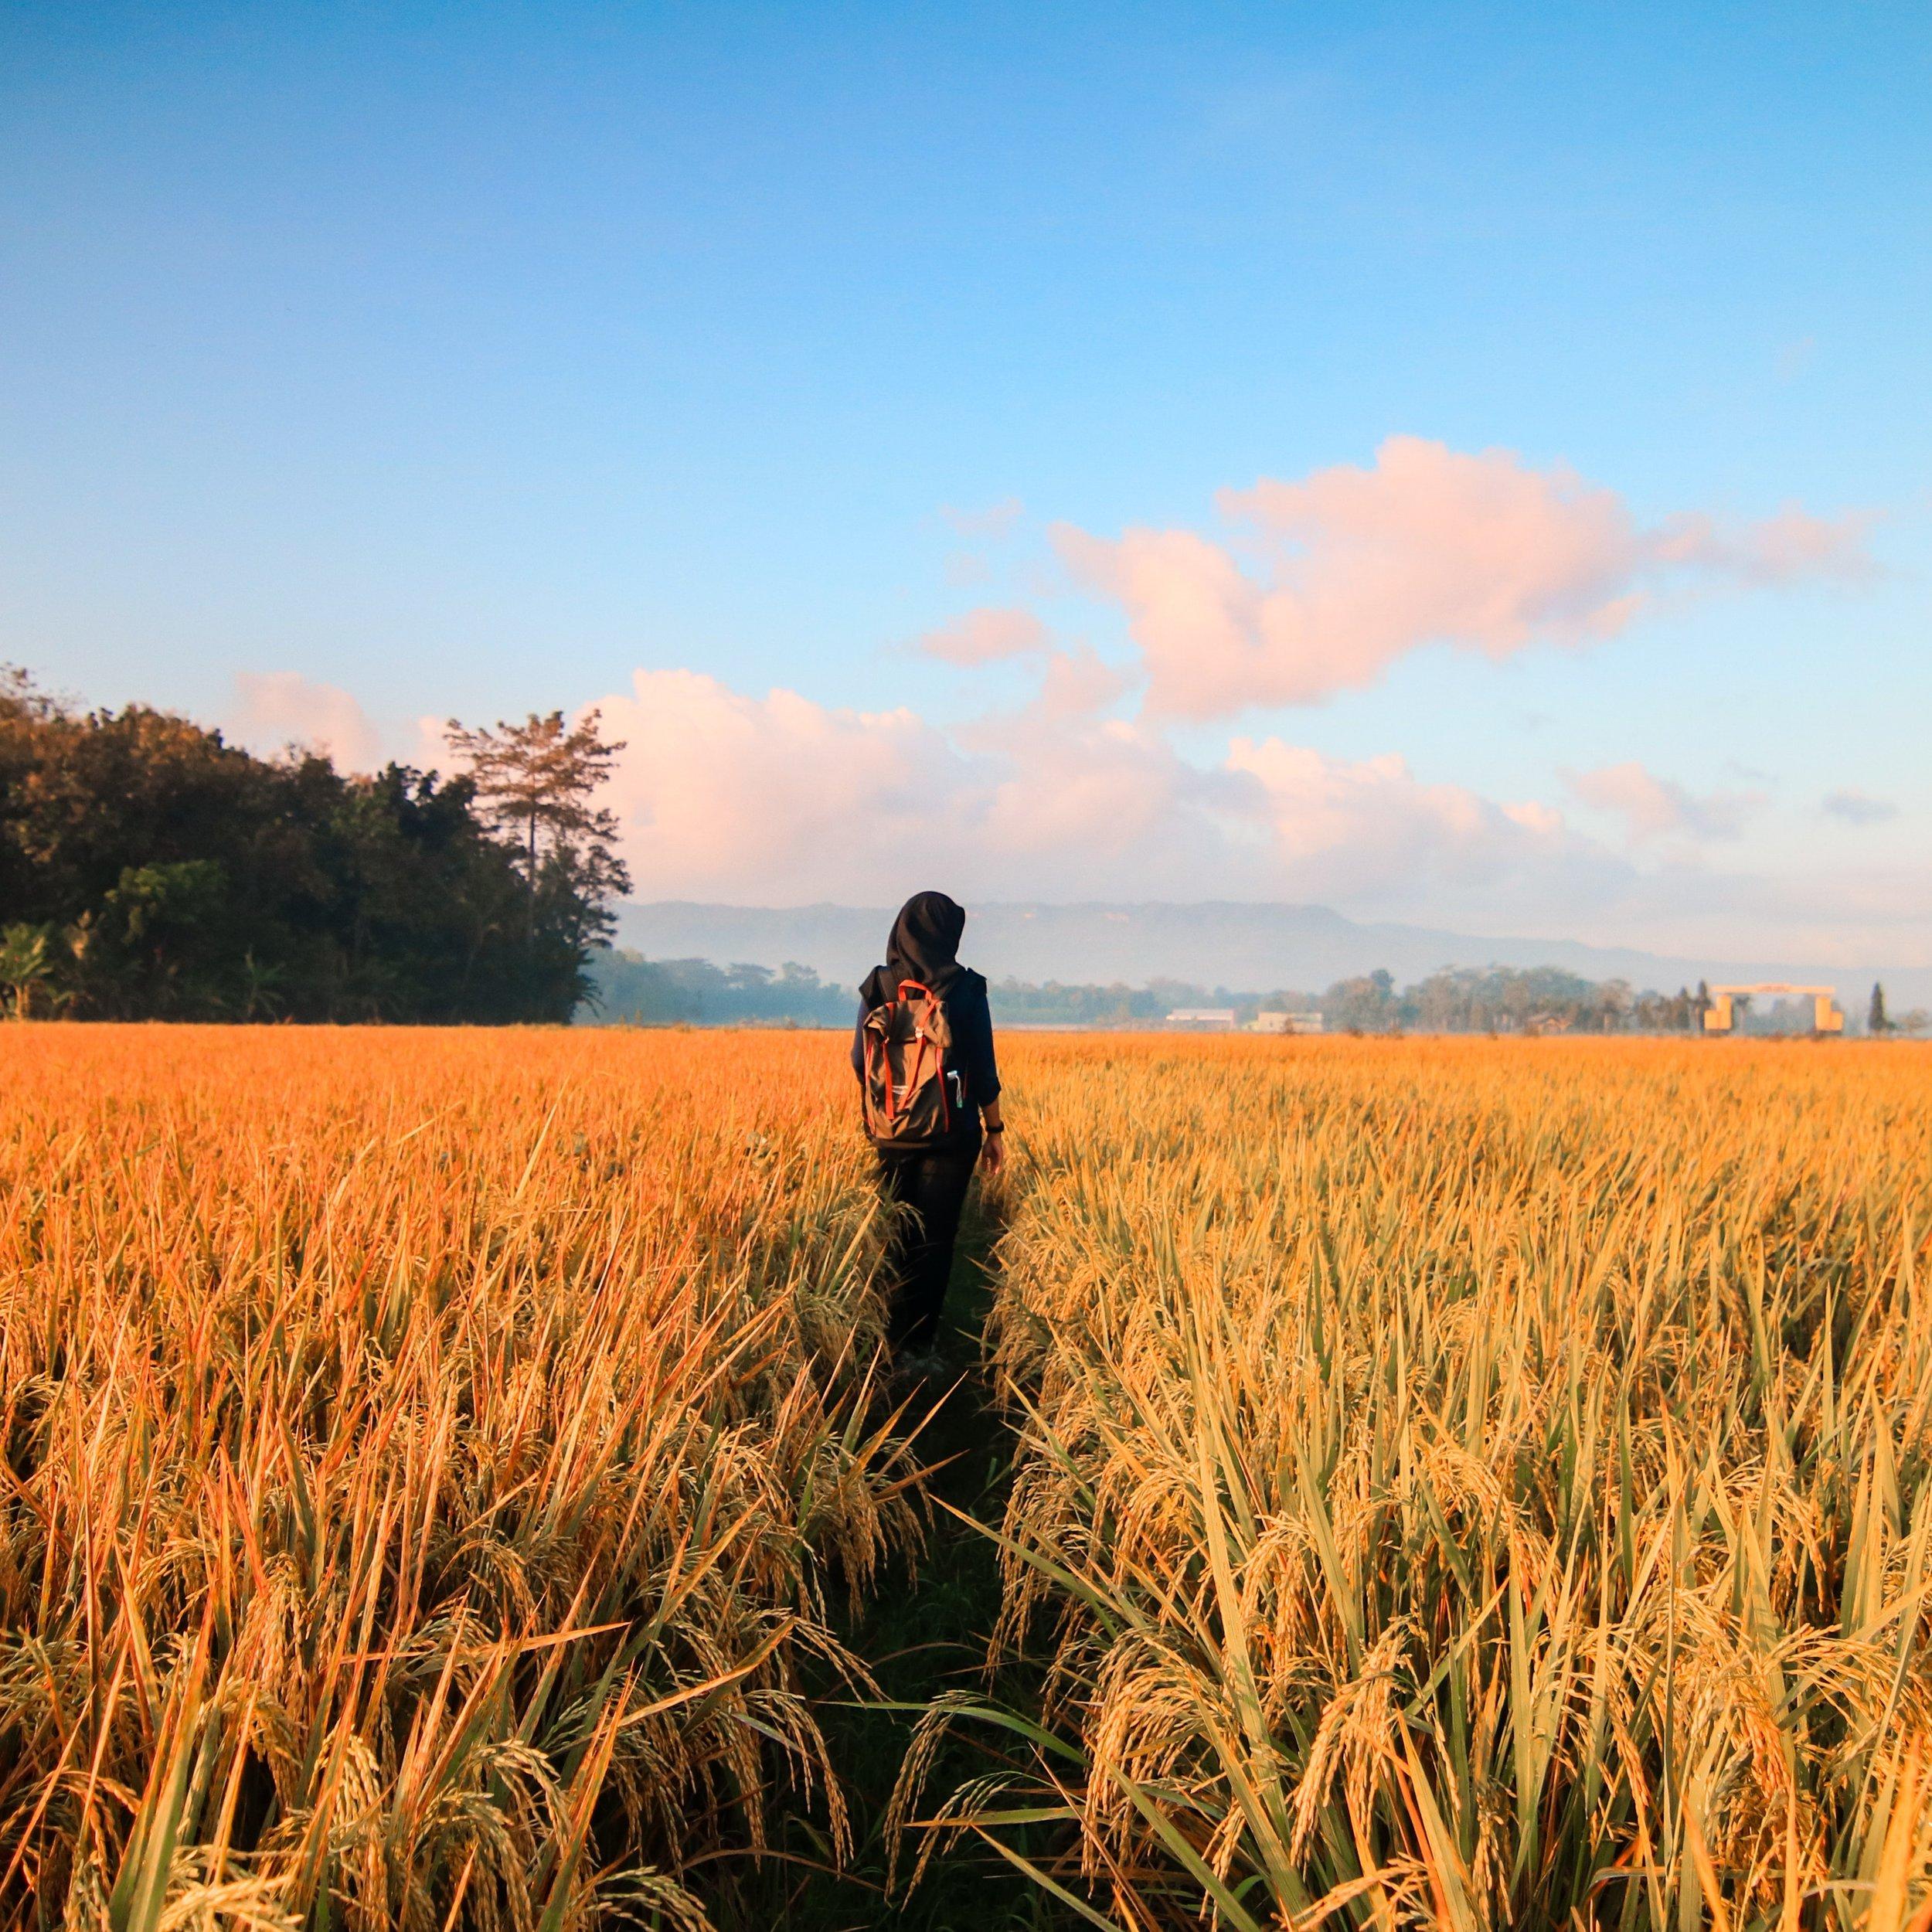 adventure-agriculture-barley-789555.jpg